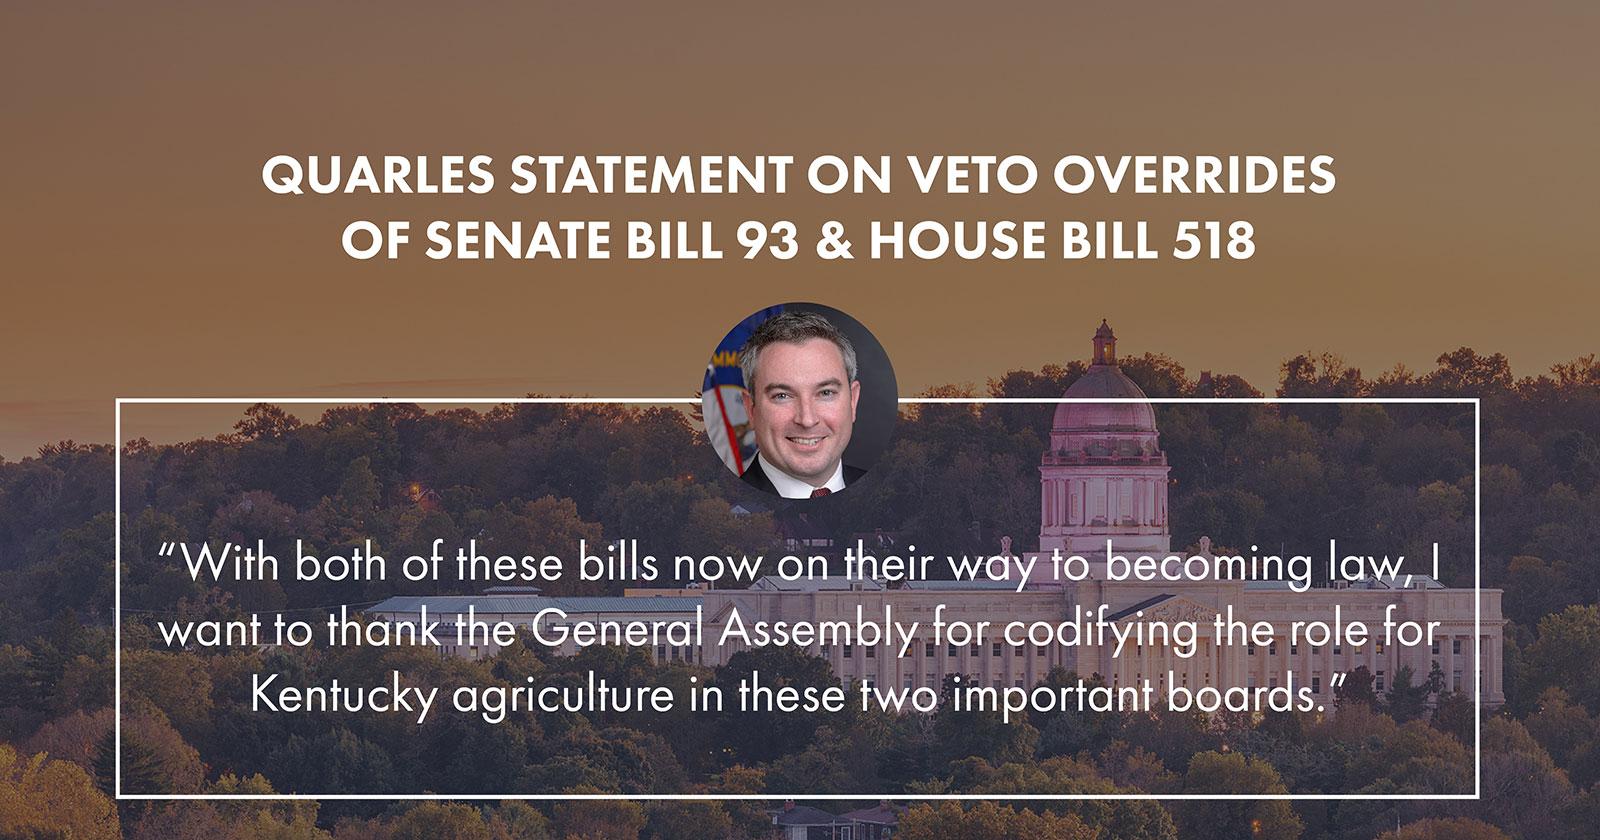 Quarles' statement on veto overrides